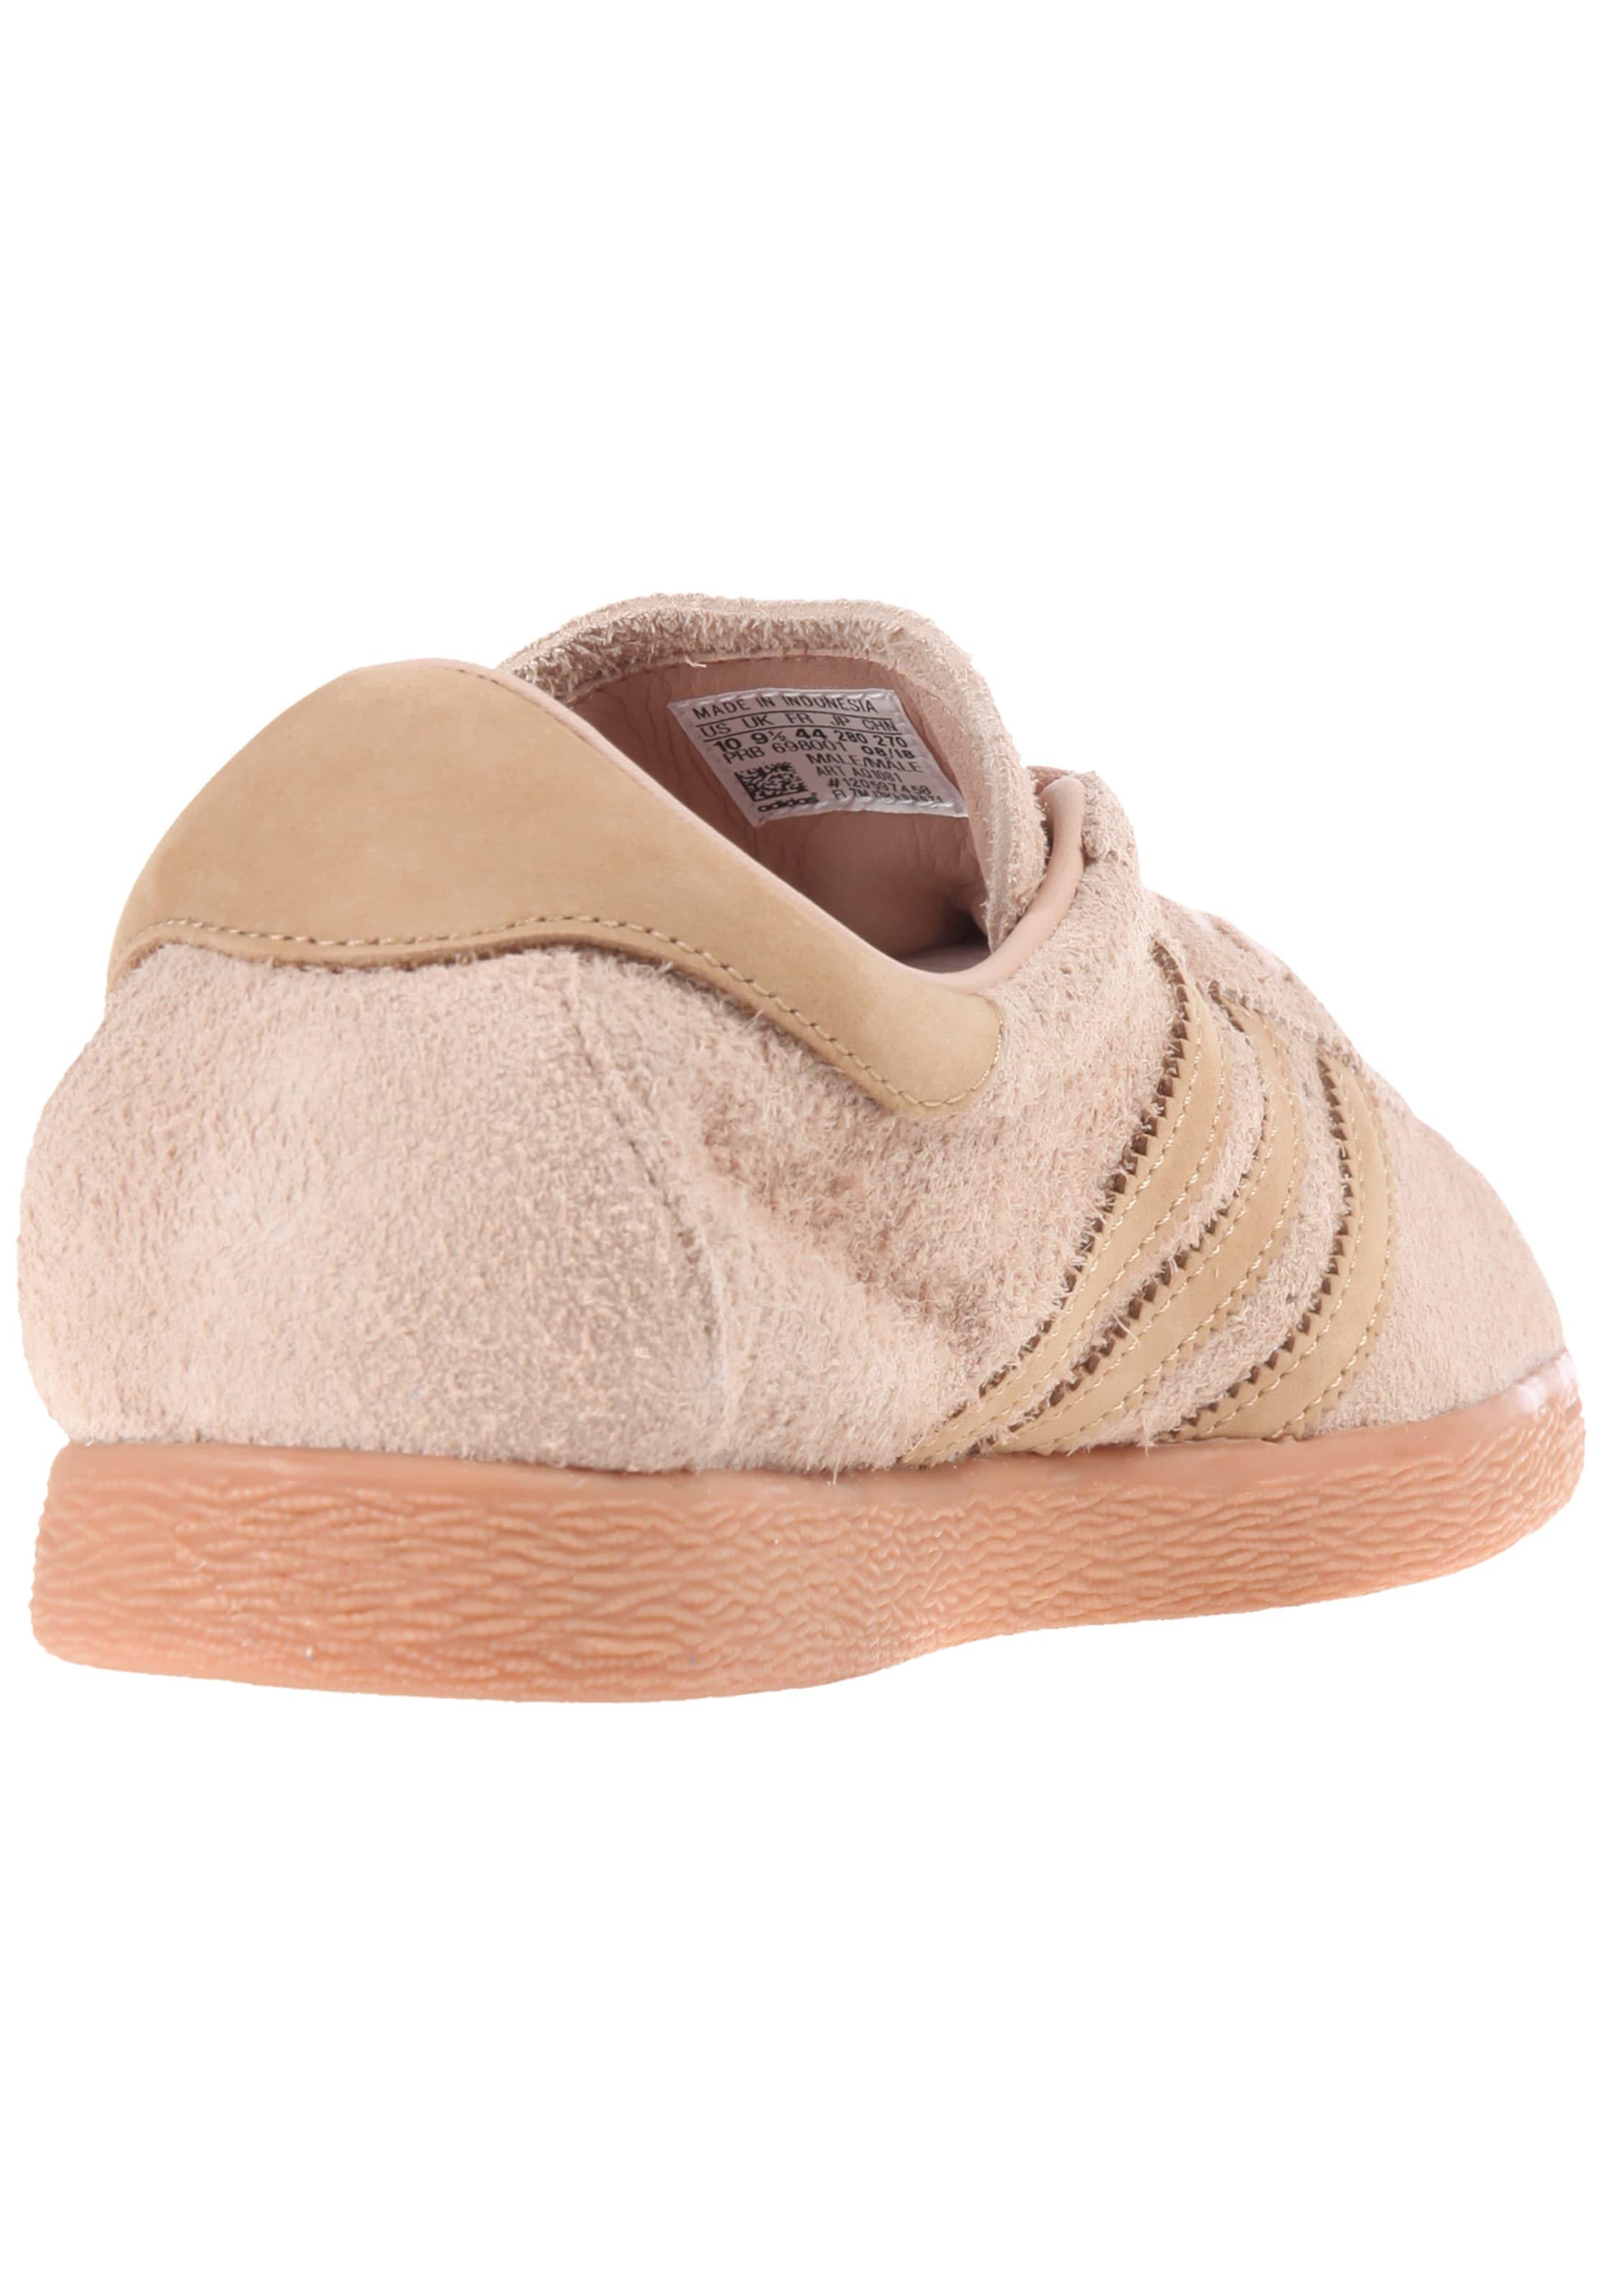 Originals Adidas In Sneakers Donkerbeige Laag vxH1PnHq